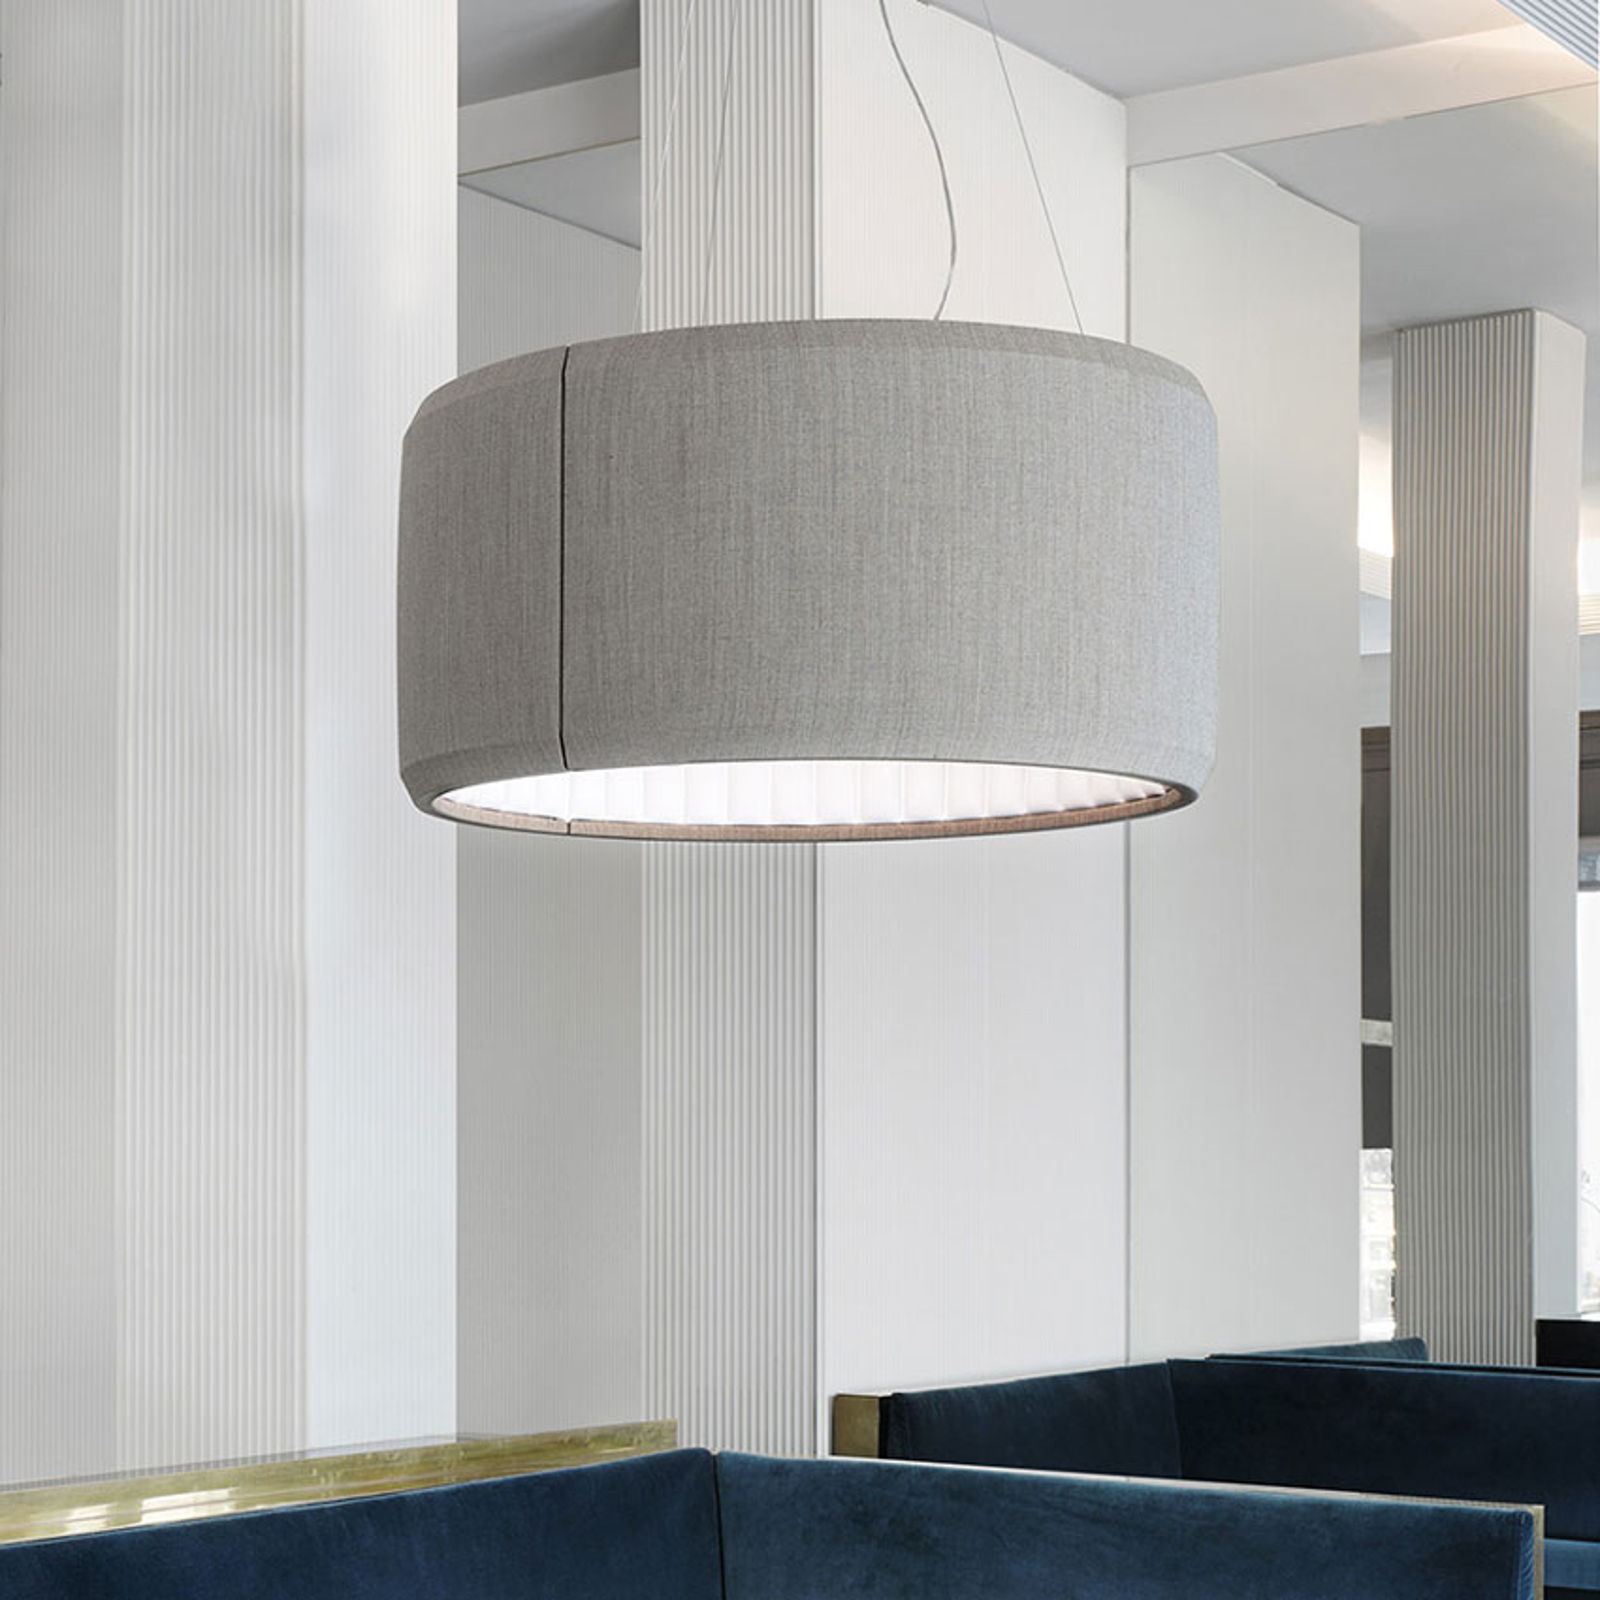 Luceplan Silenzio LED-pendellampe grå Ø 90 cm